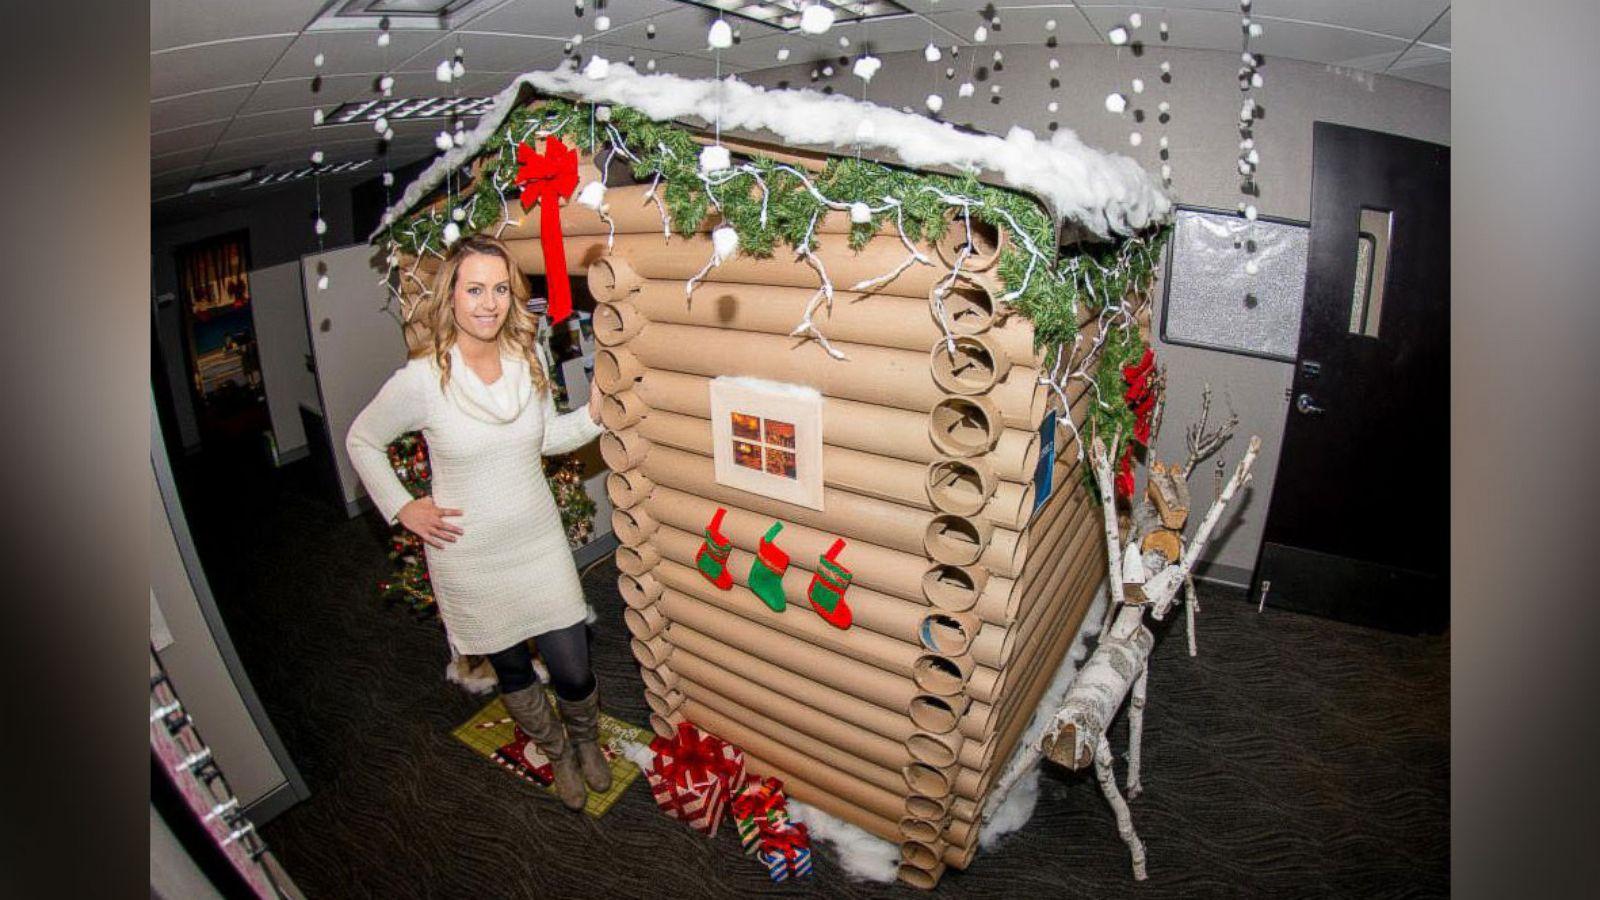 Cubicle Into a Christmas Log